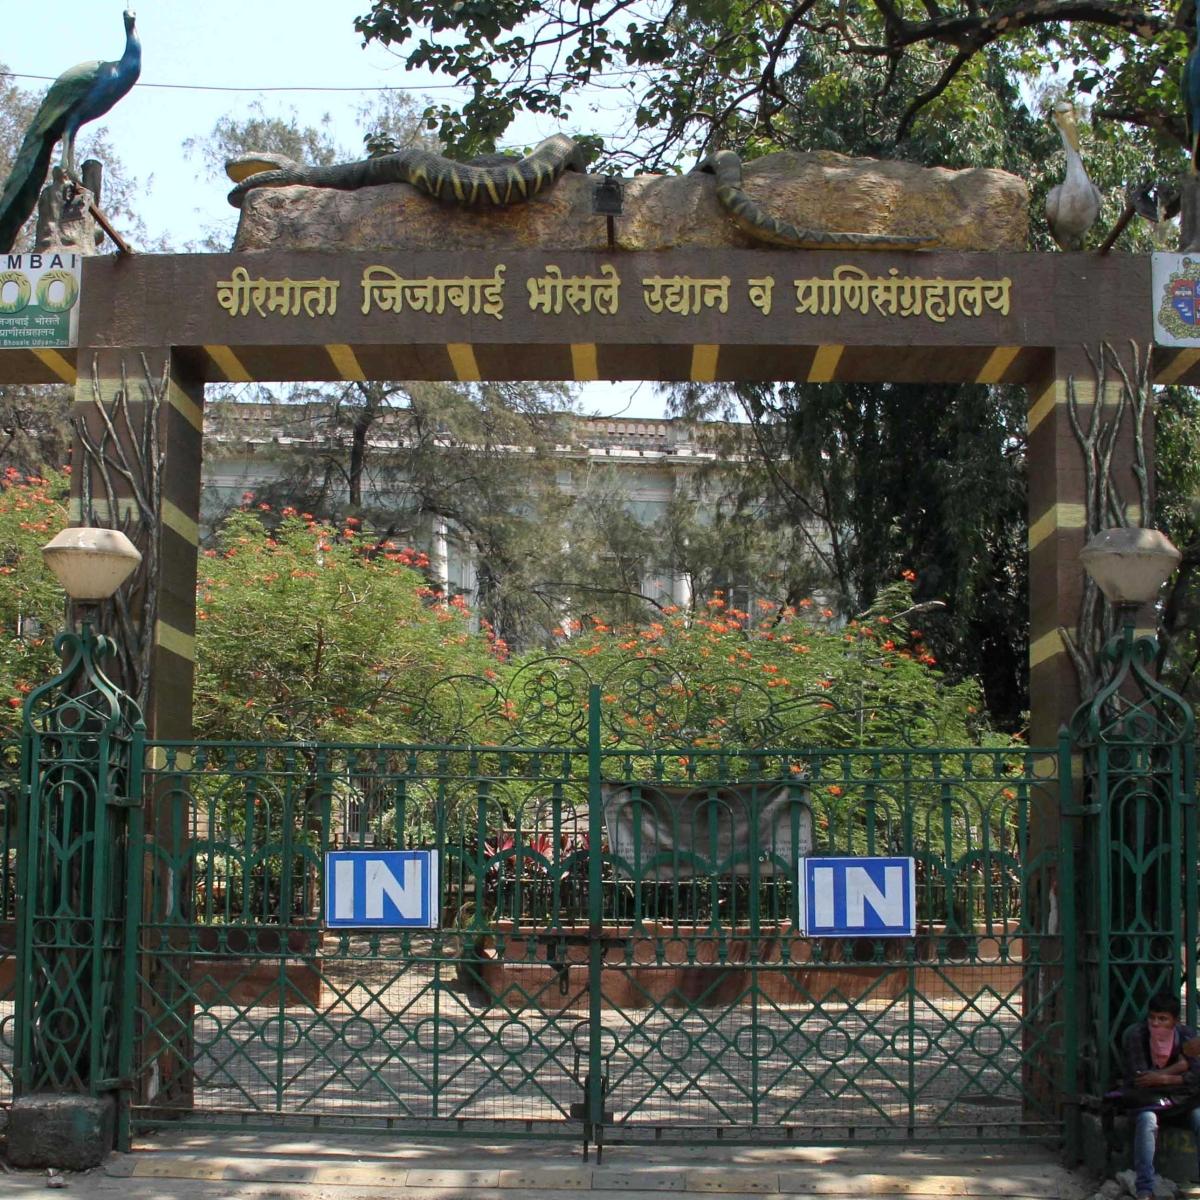 Mumbai: Amid coronavirus outbreak, BMC shuts parks, gardens to discourage mass gatherings